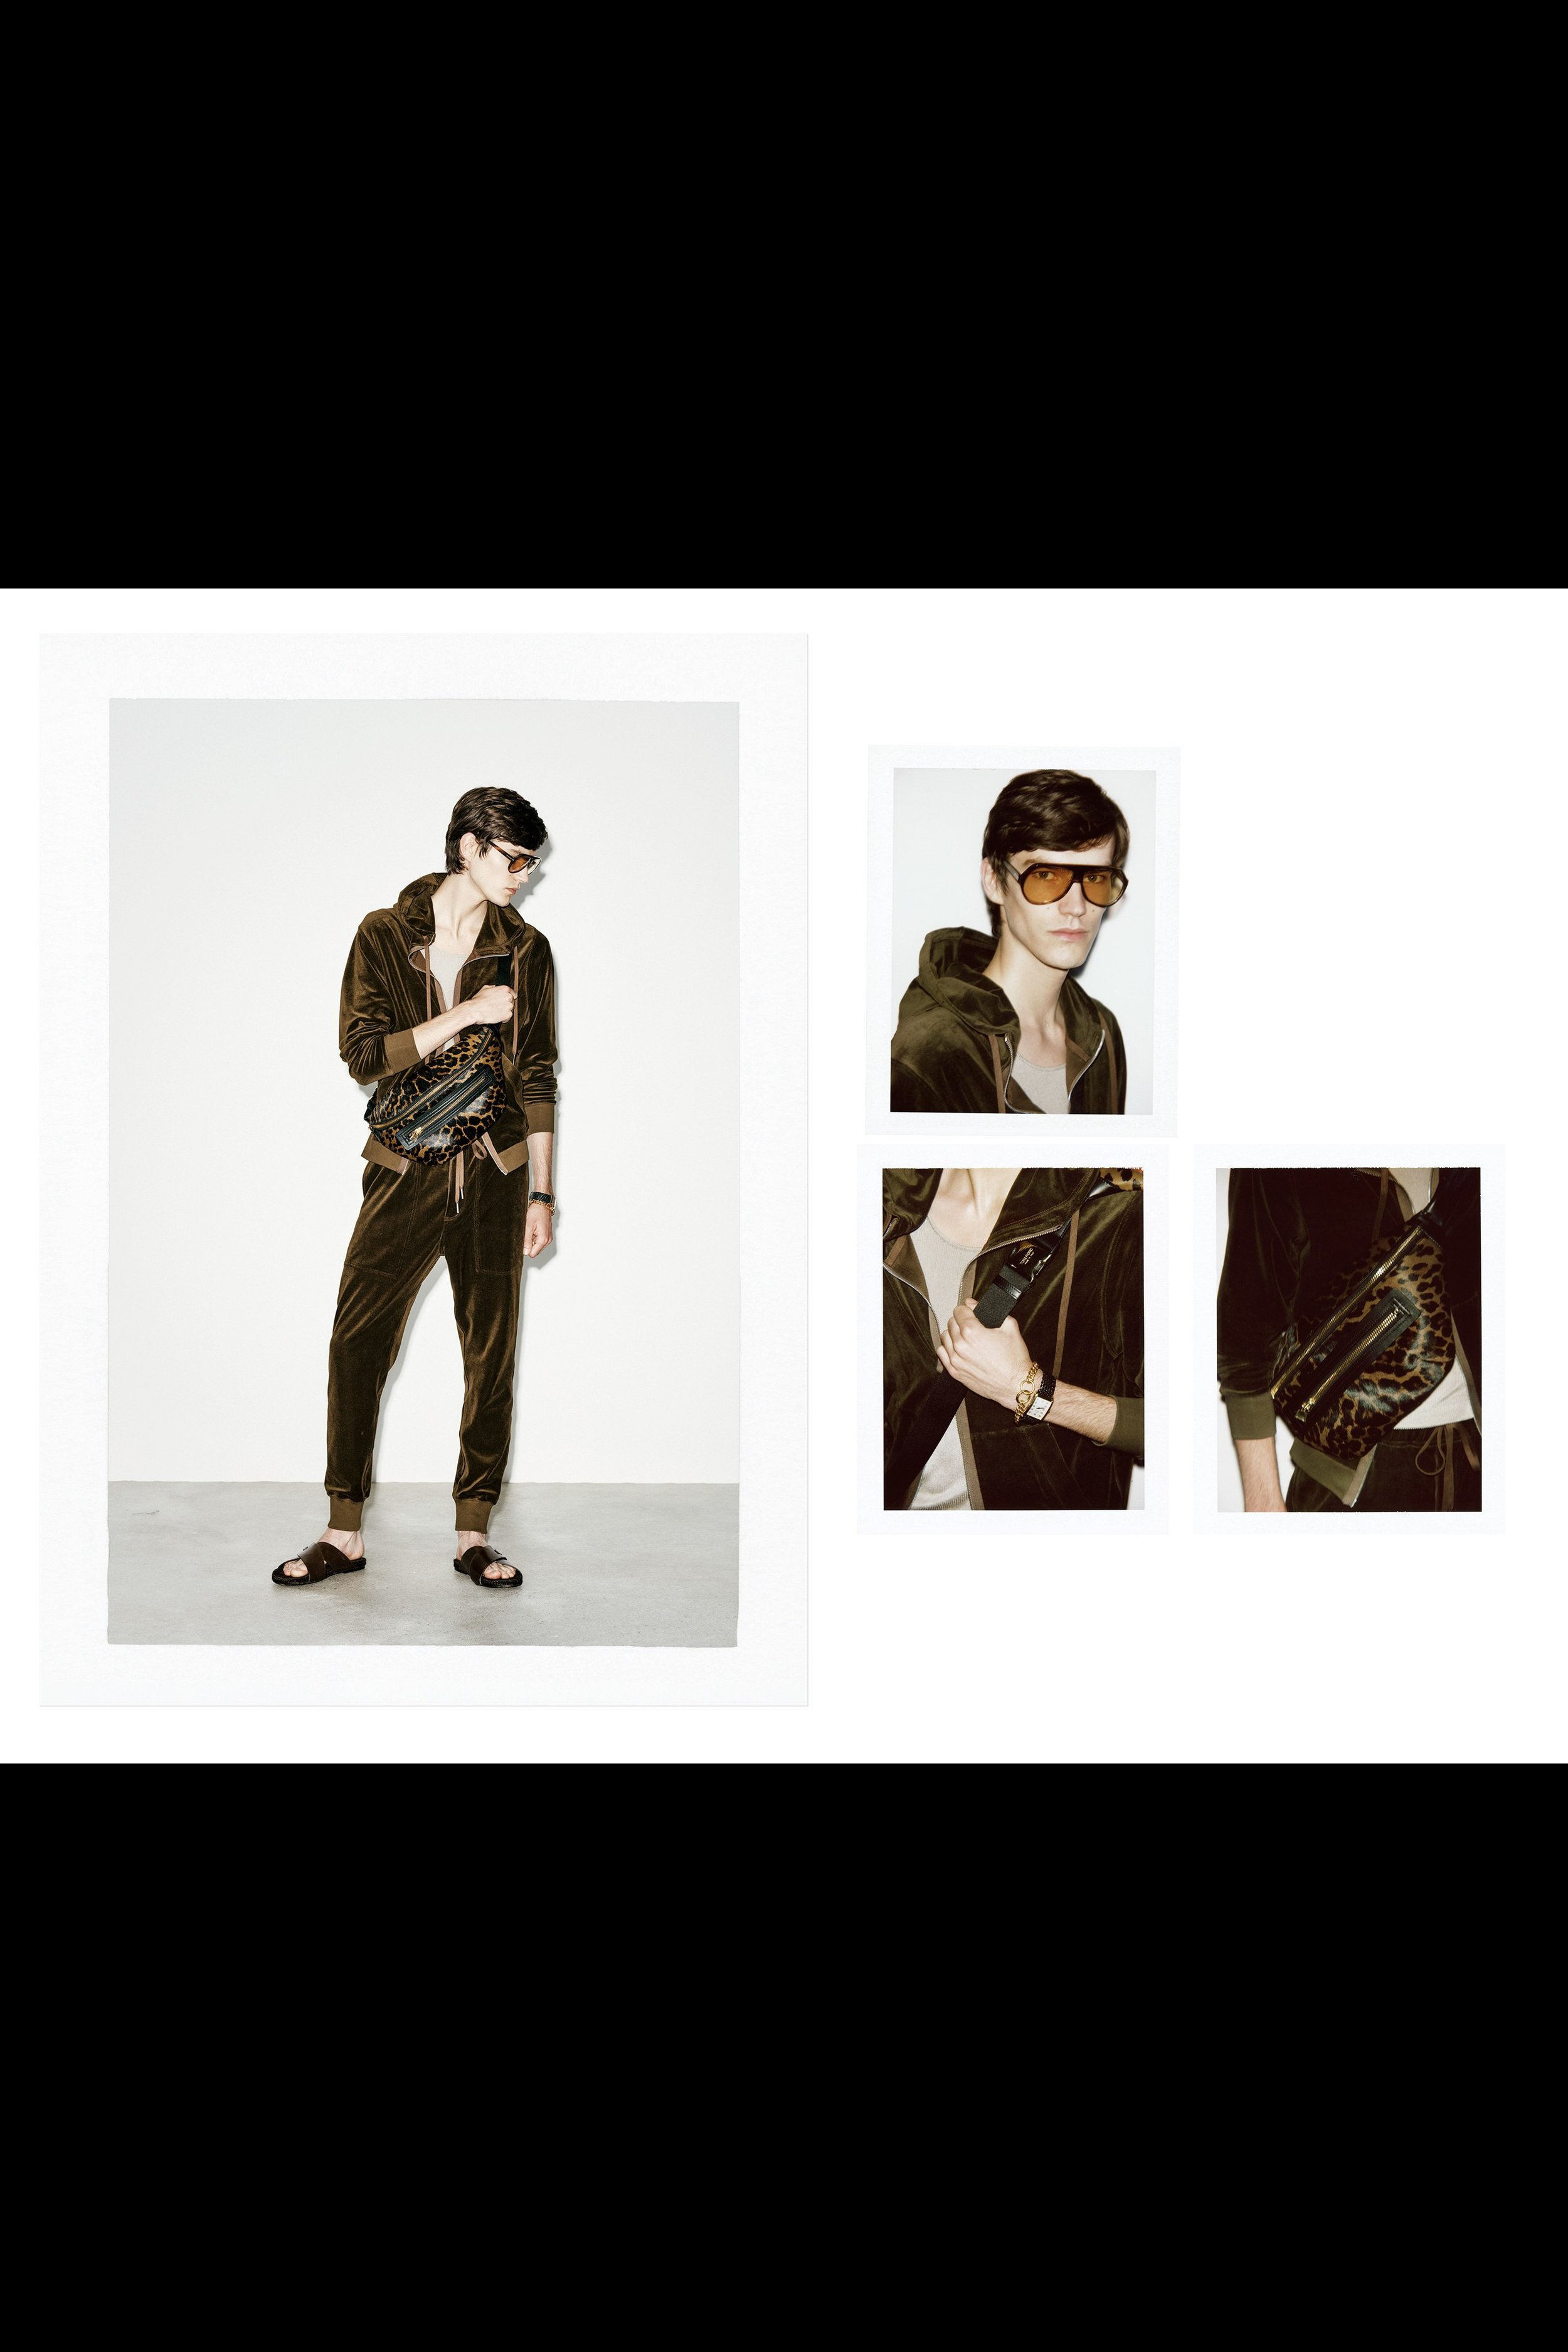 00020-Tom-Ford-vogue-menswear-spring-2019-pr.jpg